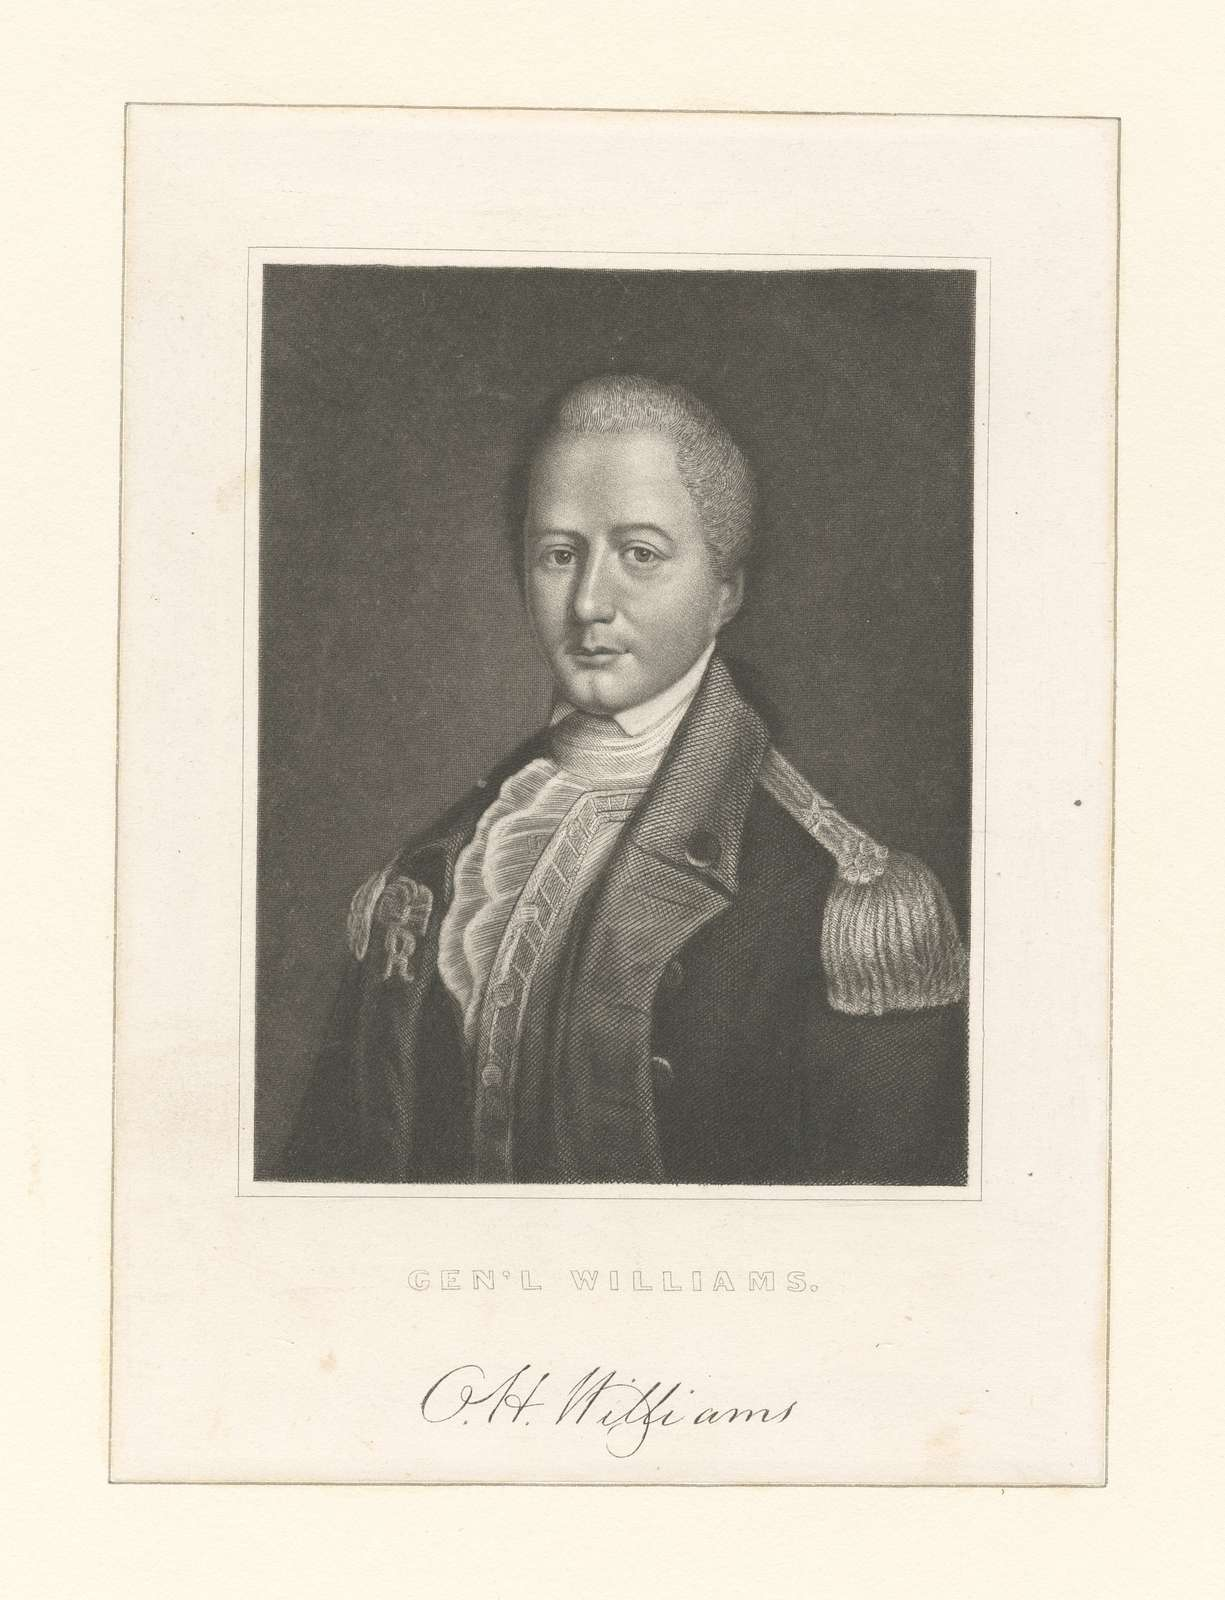 Genl. Williams